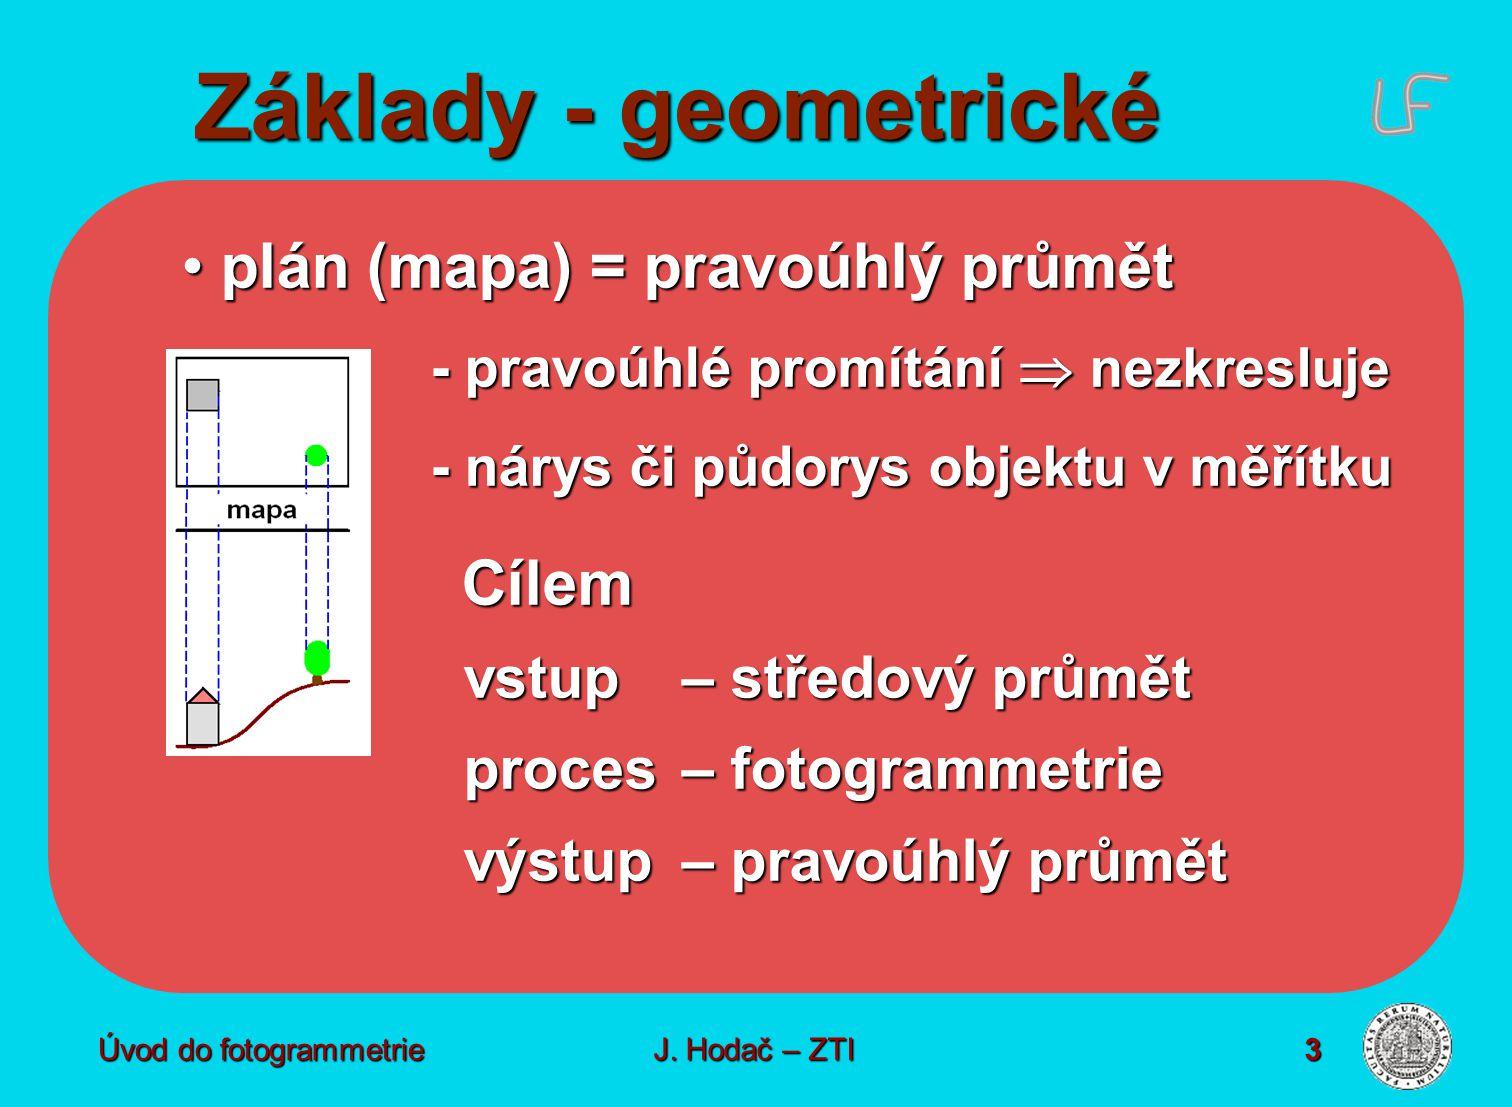 Úvod do fotogrammetrie3 Základy - geometrické plán (mapa) = pravoúhlý průmět plán (mapa) = pravoúhlý průmět - pravoúhlé promítání  nezkresluje - náry